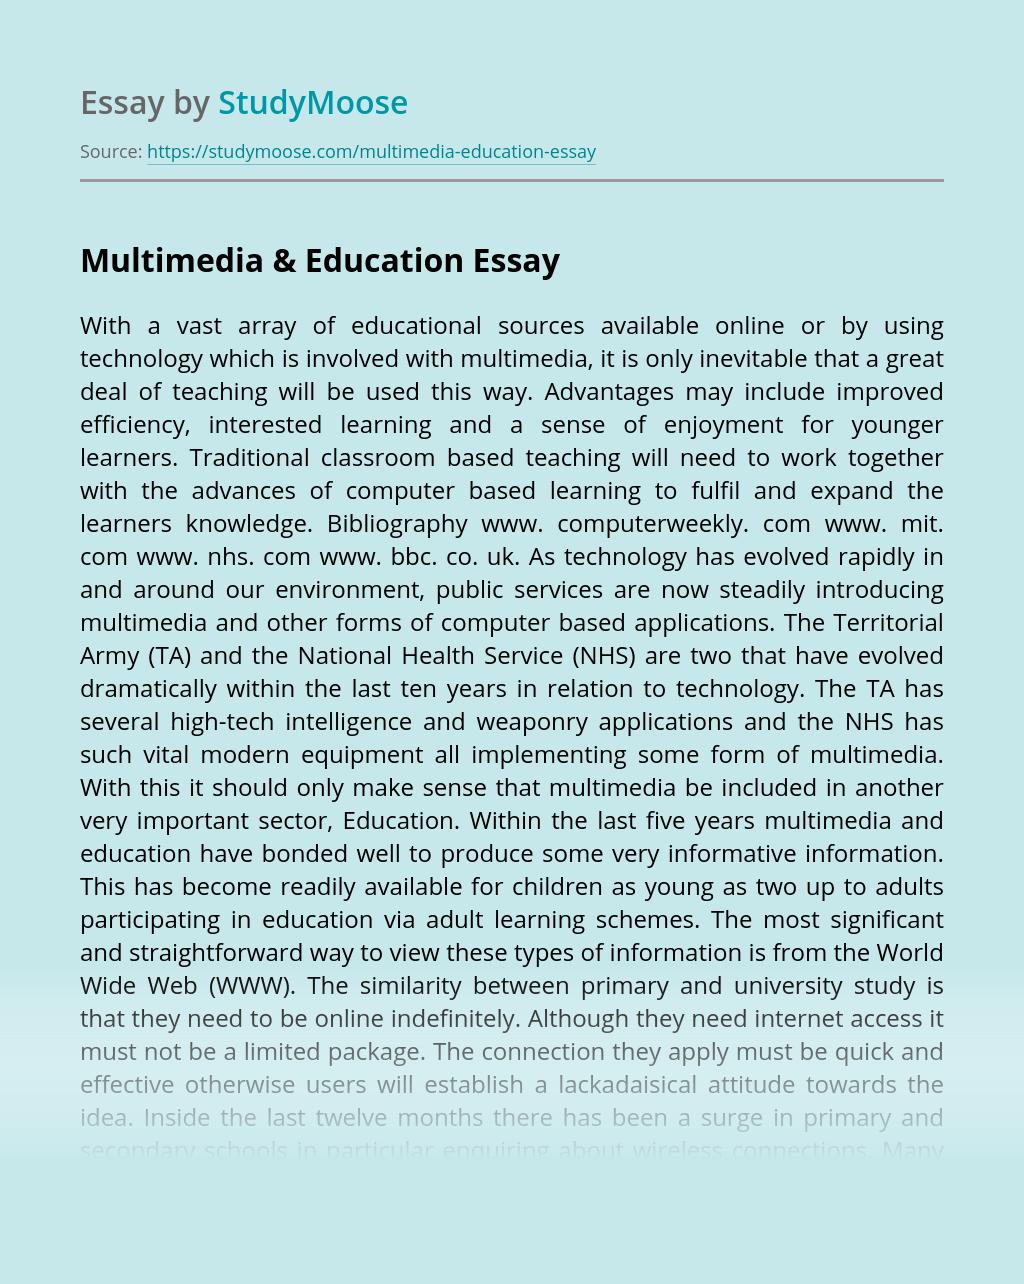 Multimedia & Education